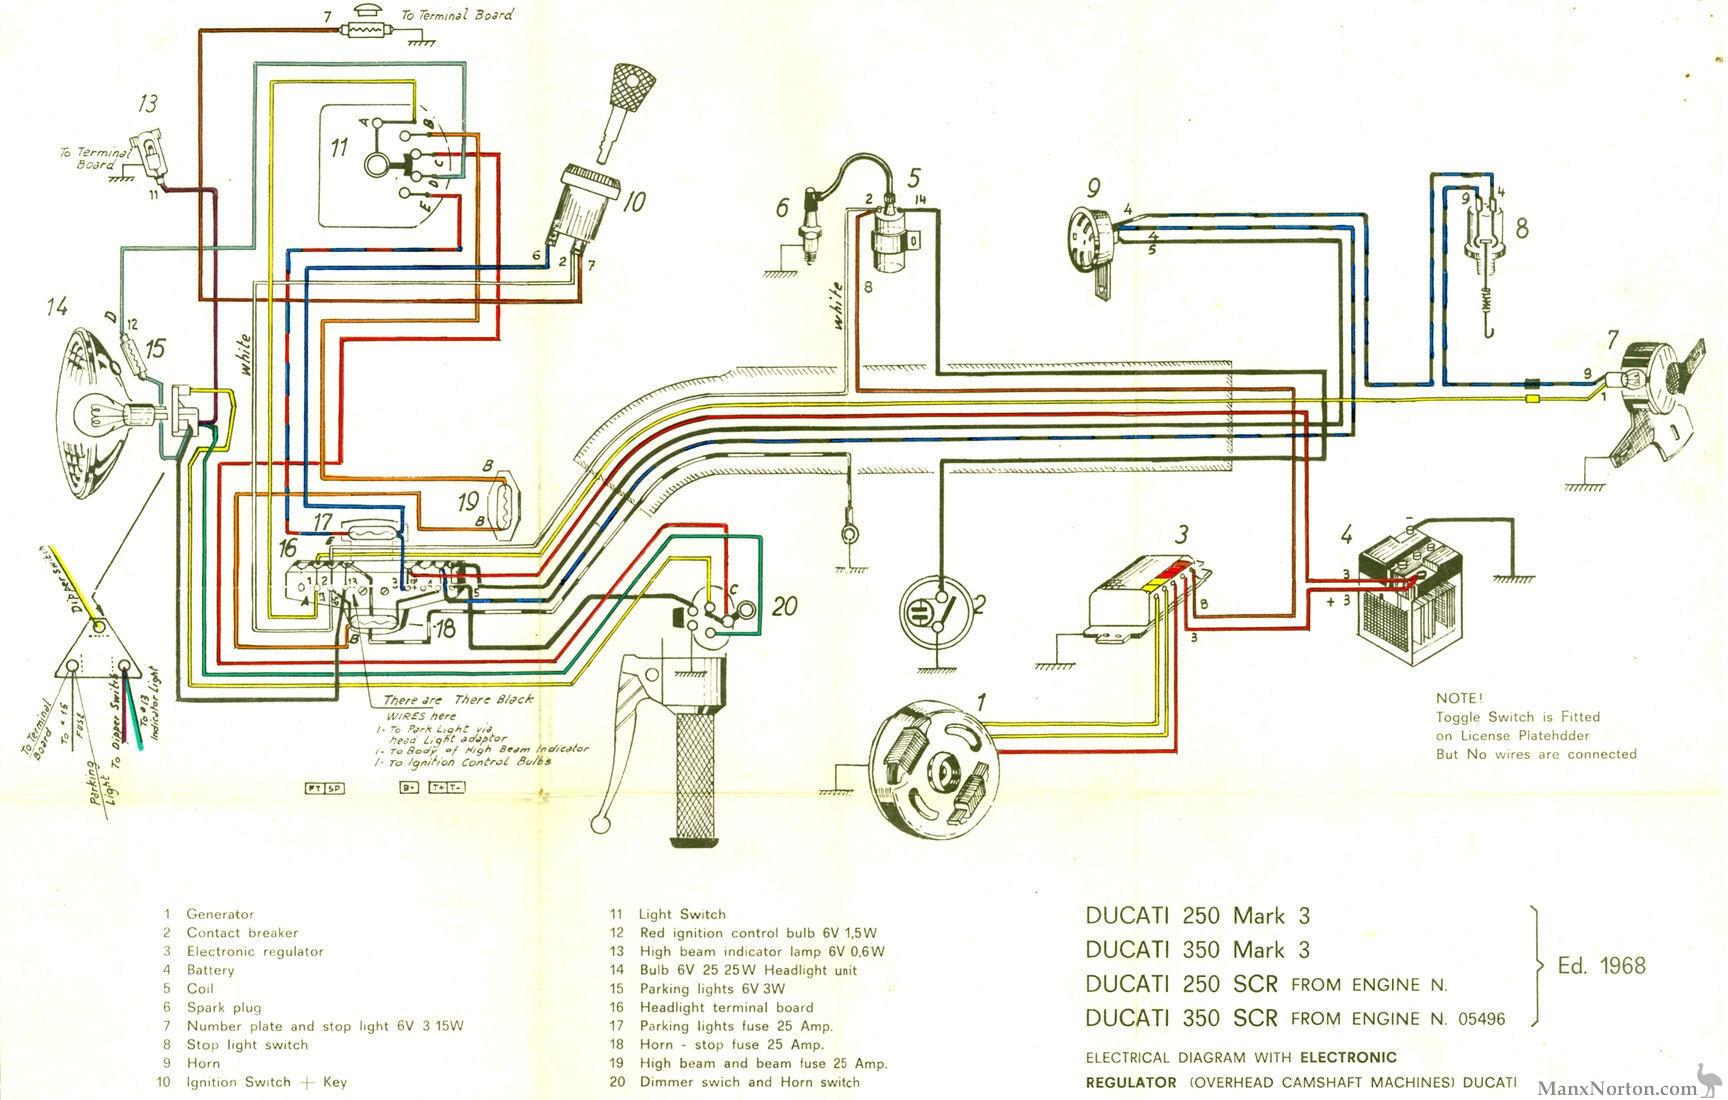 Big Dog Ignition Wiring Diagram Auto Electrical Czt Bad Boy Mowers Ducati Engine